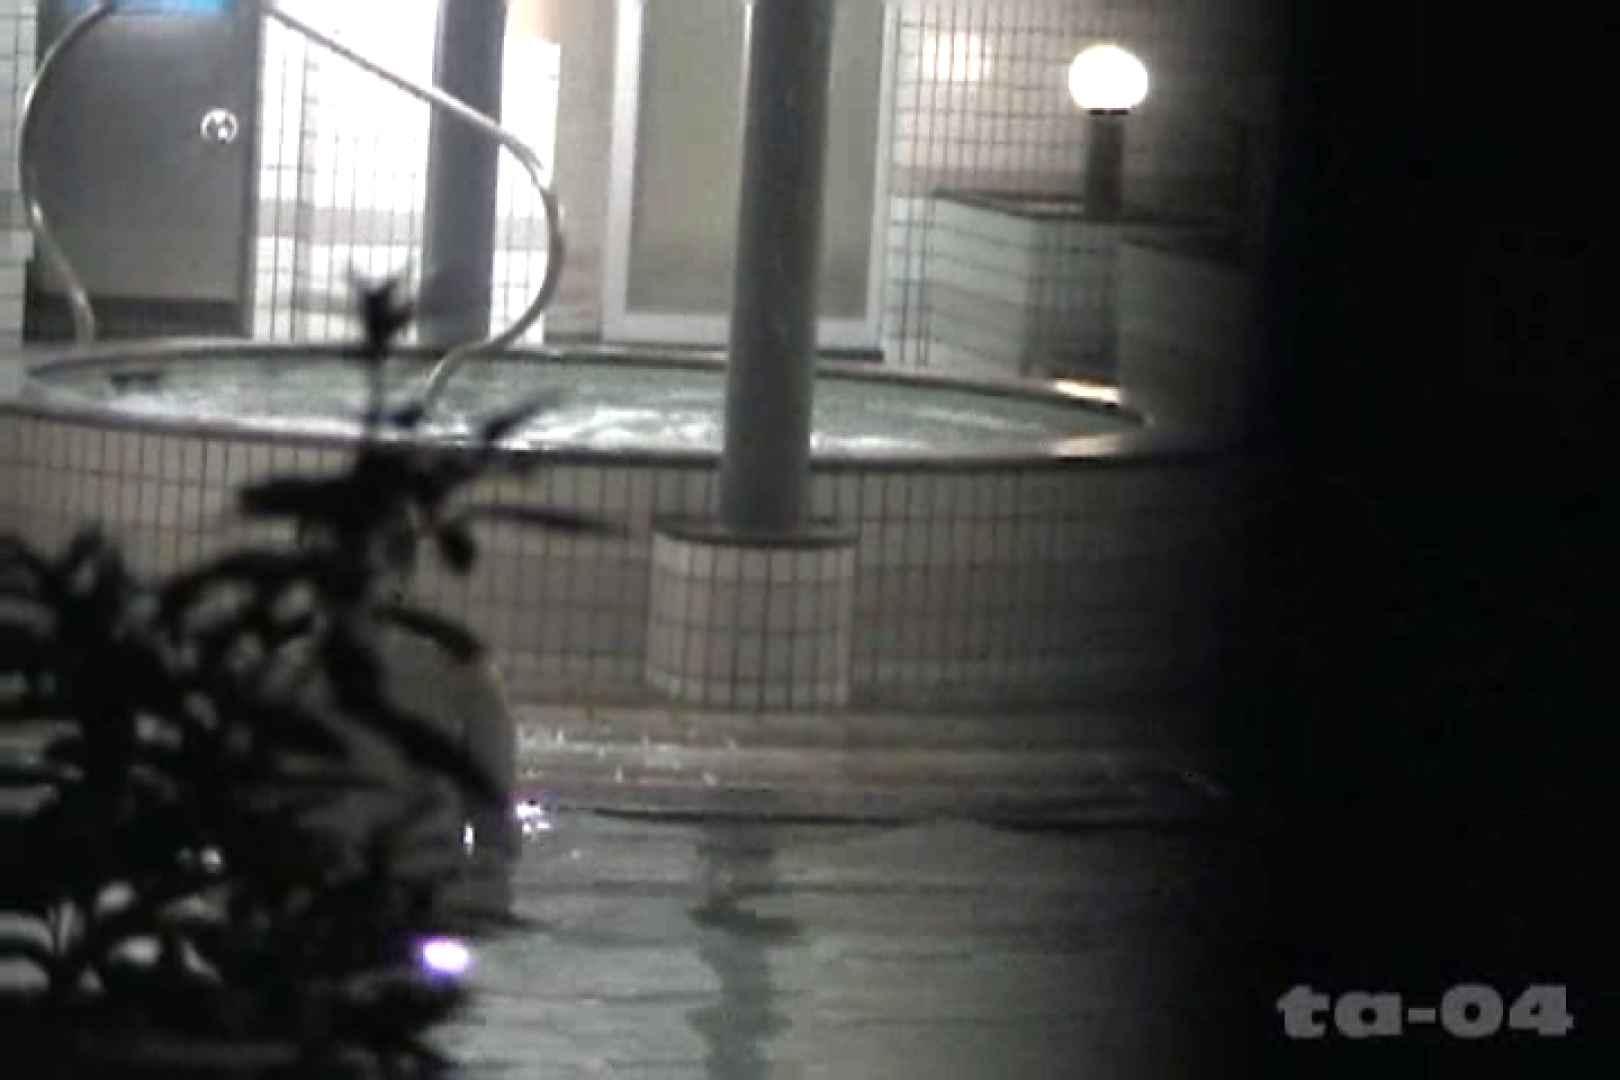 合宿ホテル女風呂盗撮高画質版 Vol.04 女風呂 オメコ無修正動画無料 83画像 79